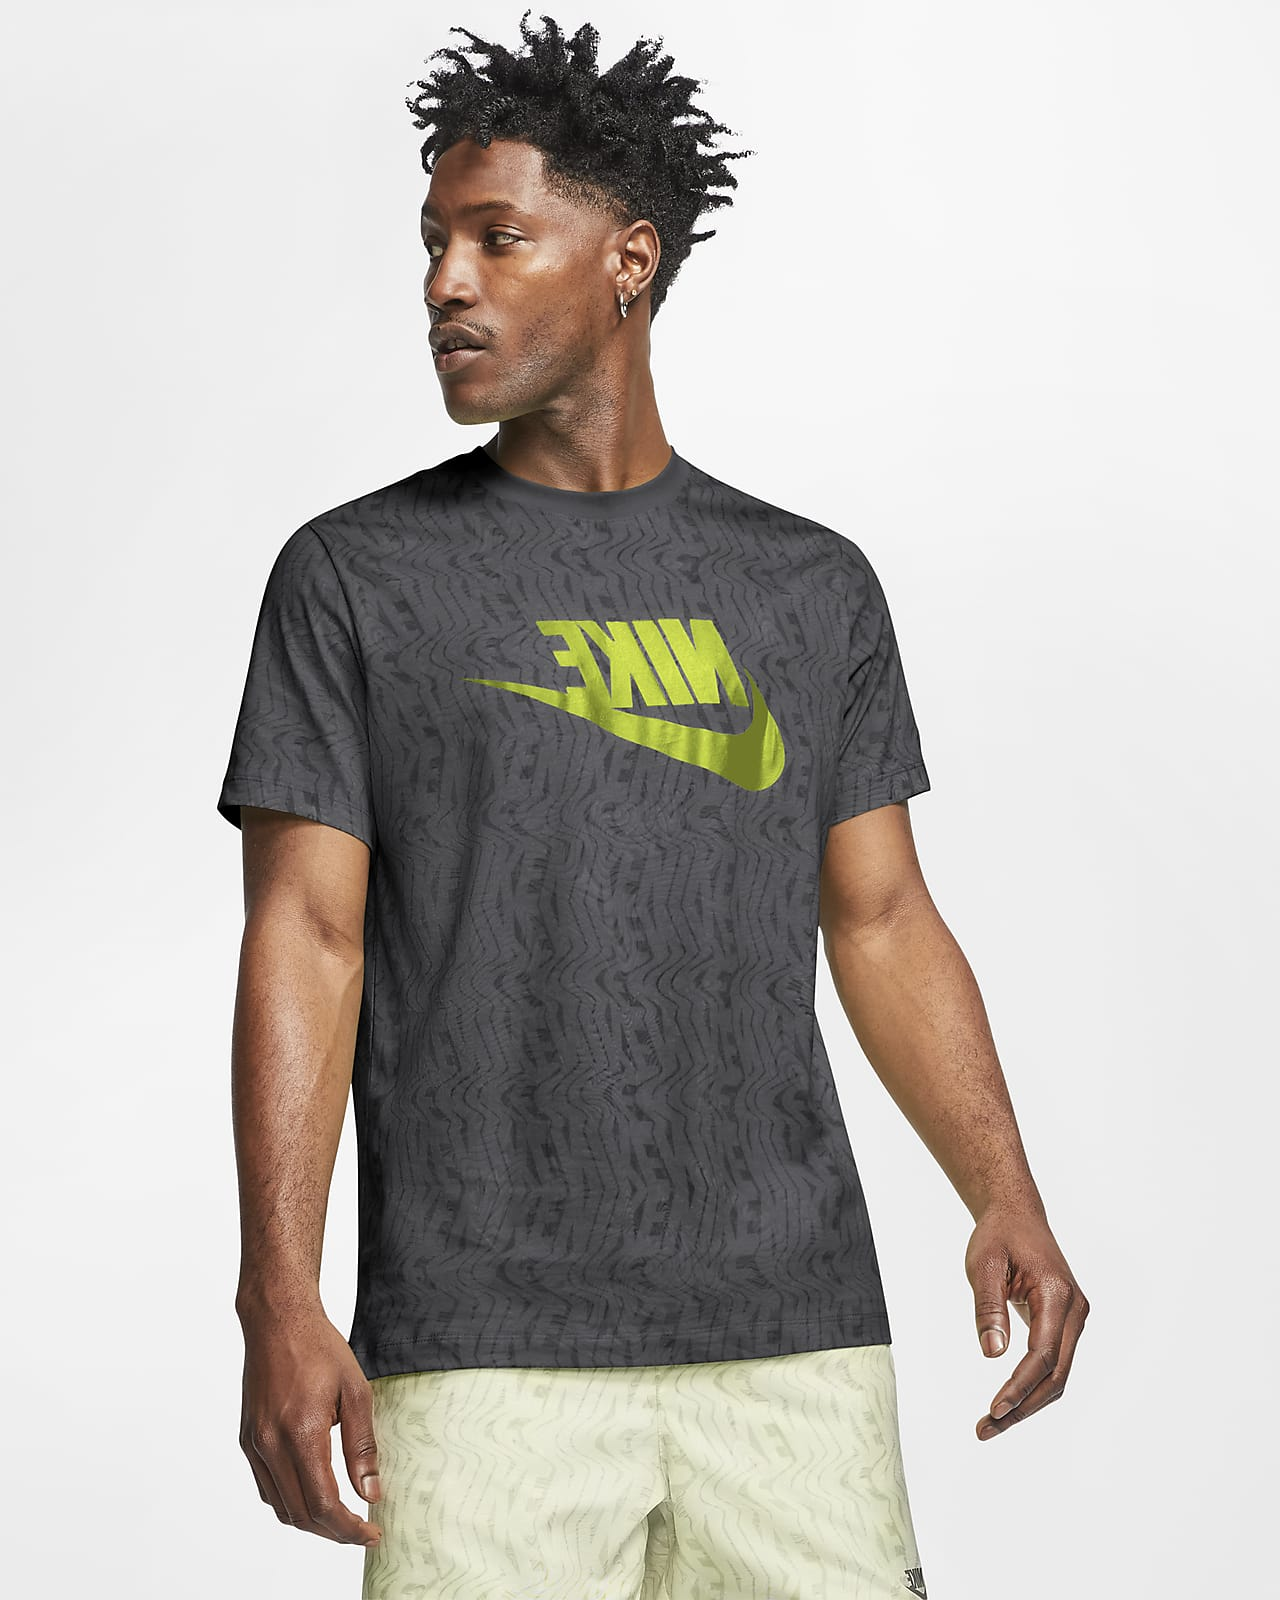 tracciare operazione senso  Nike Sportswear Men's T-Shirt. Nike GB